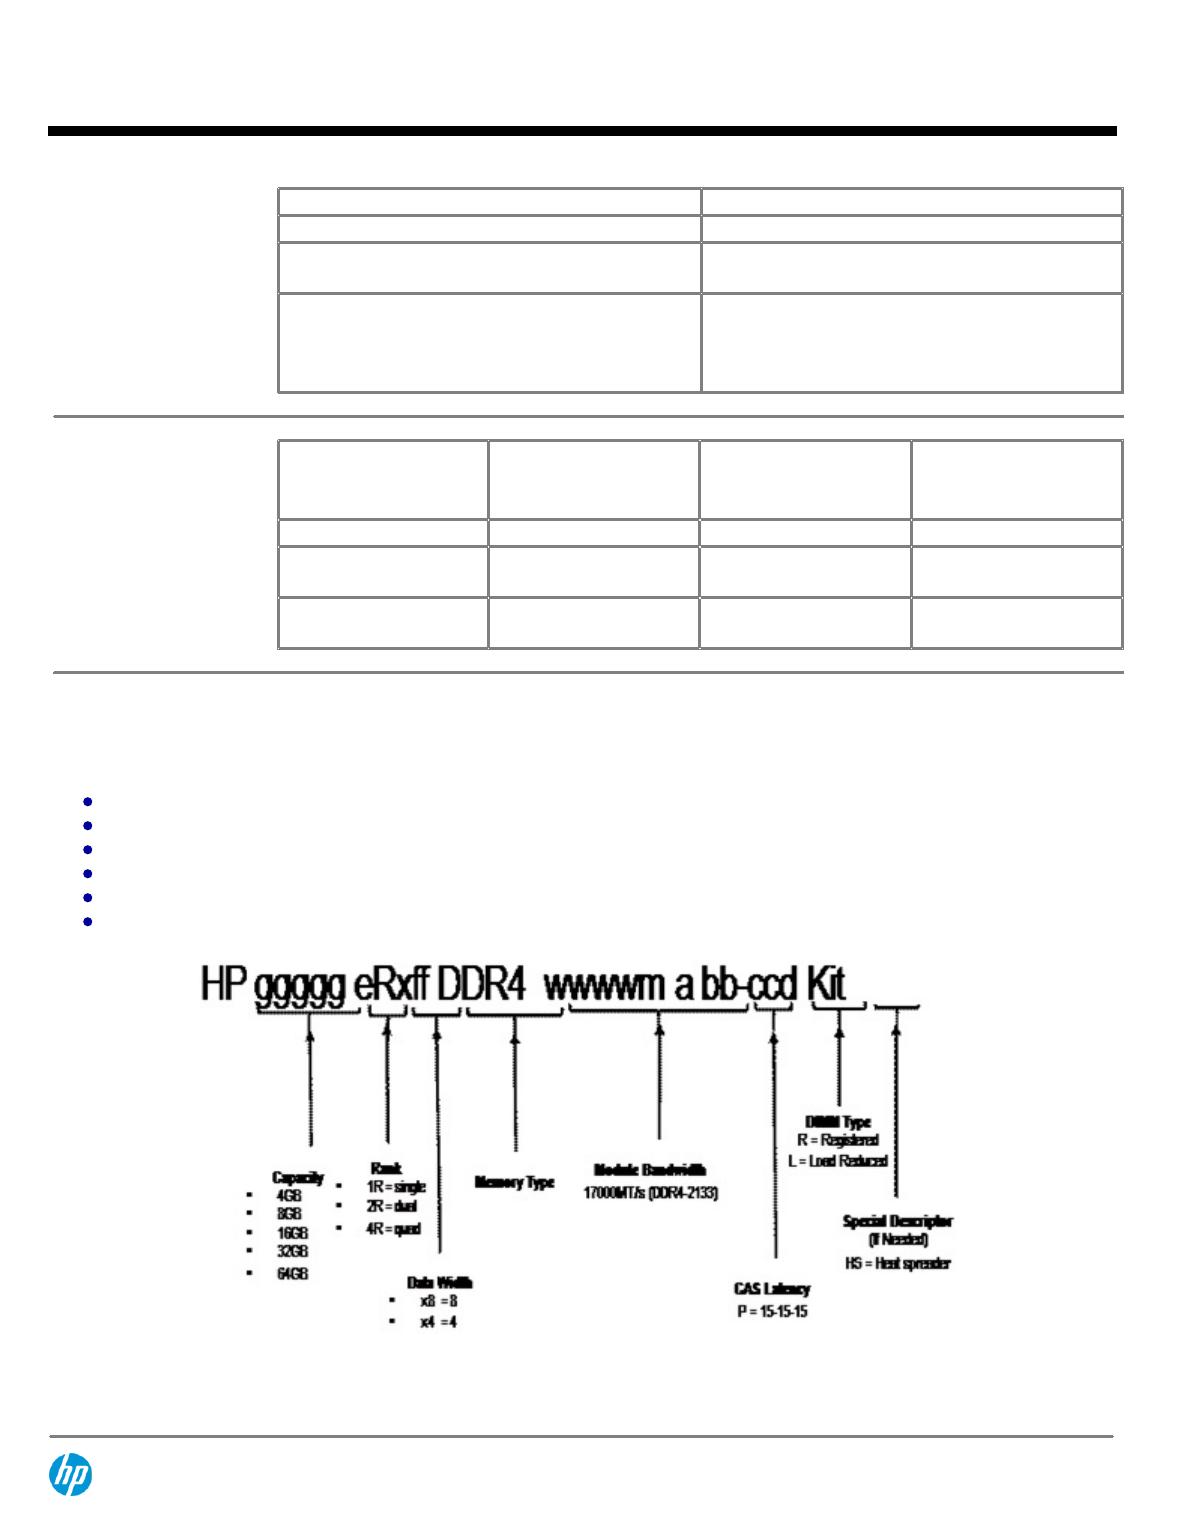 Lowrance Elite 7 Wiring Diagram 127 49 Detailed Diagrams 5 669777 B21 Ciplatadalafil Info